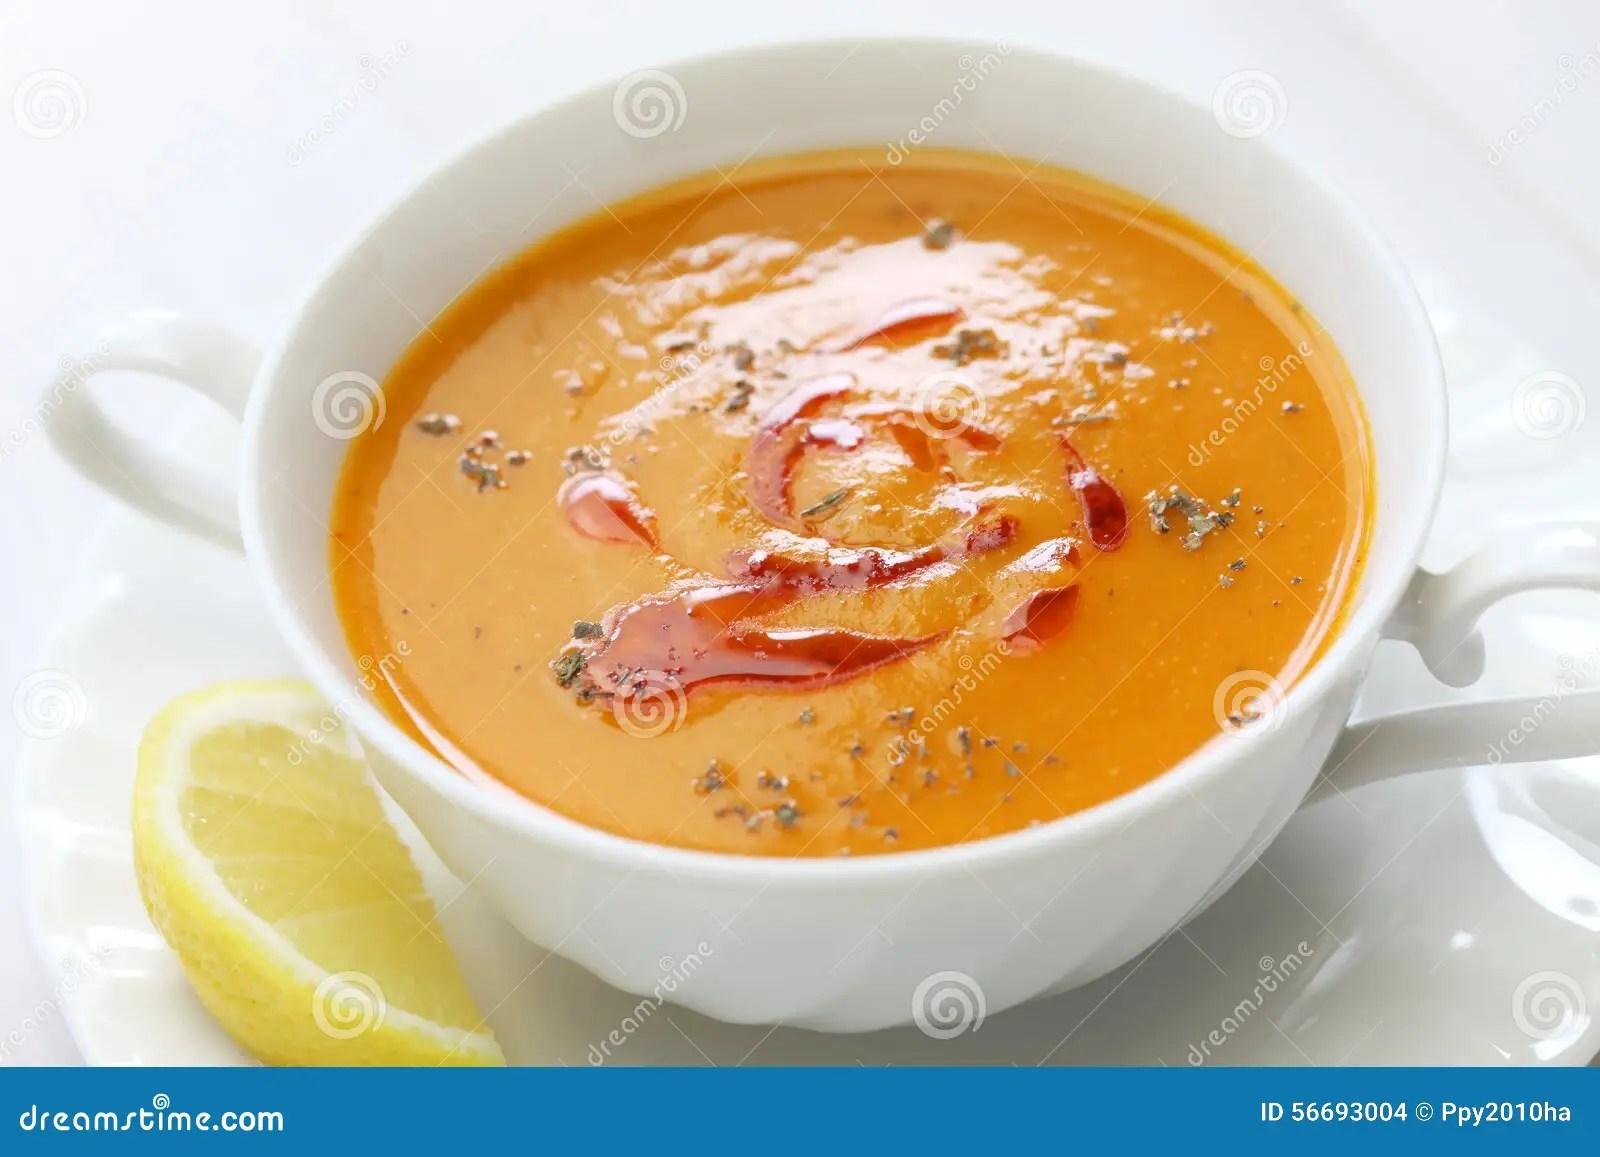 Sopa De Lenteja Roja Cocina Turca Foto de archivo